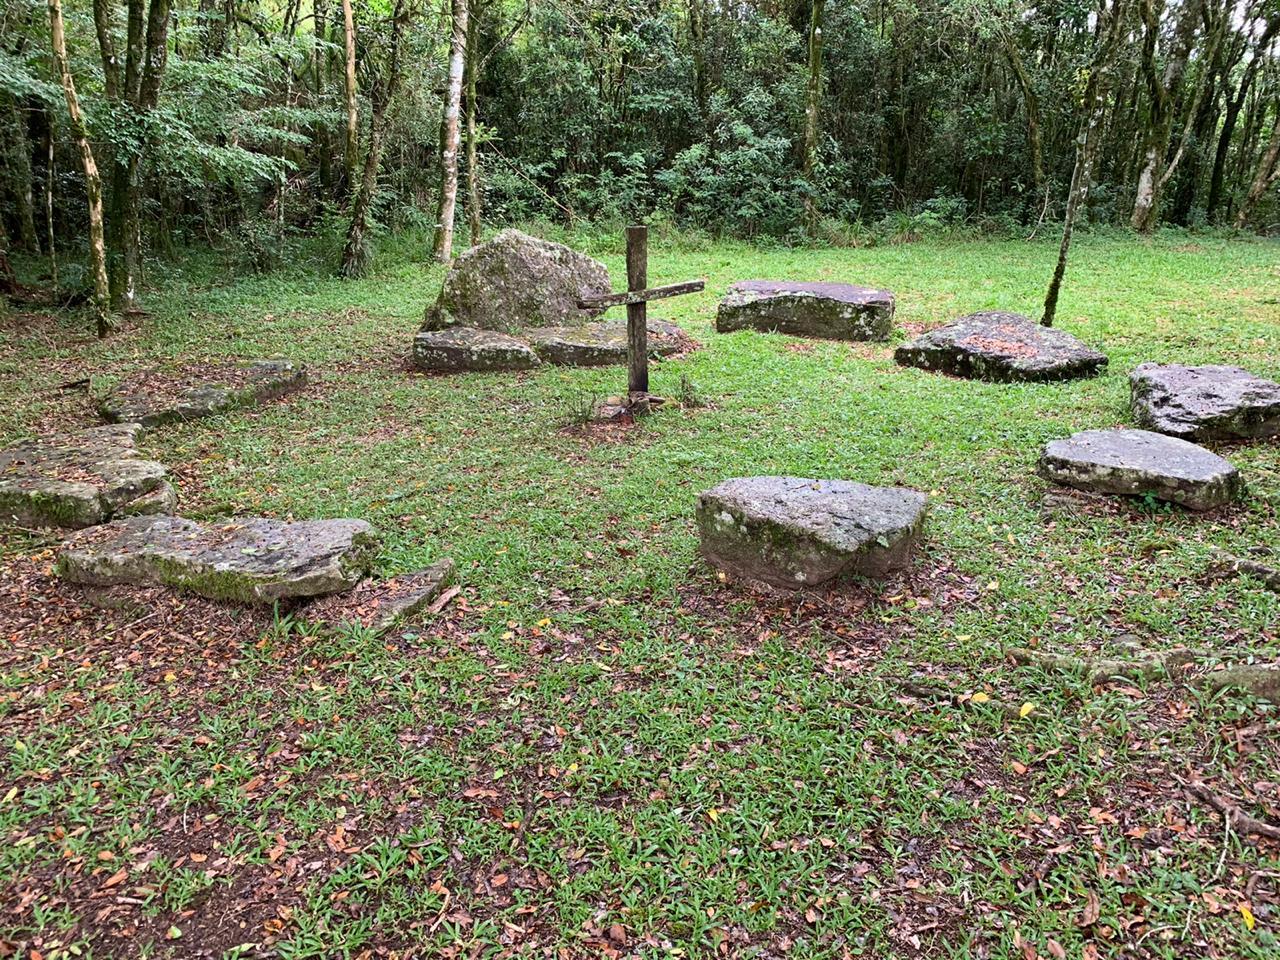 foto mostra uma sepultura da época